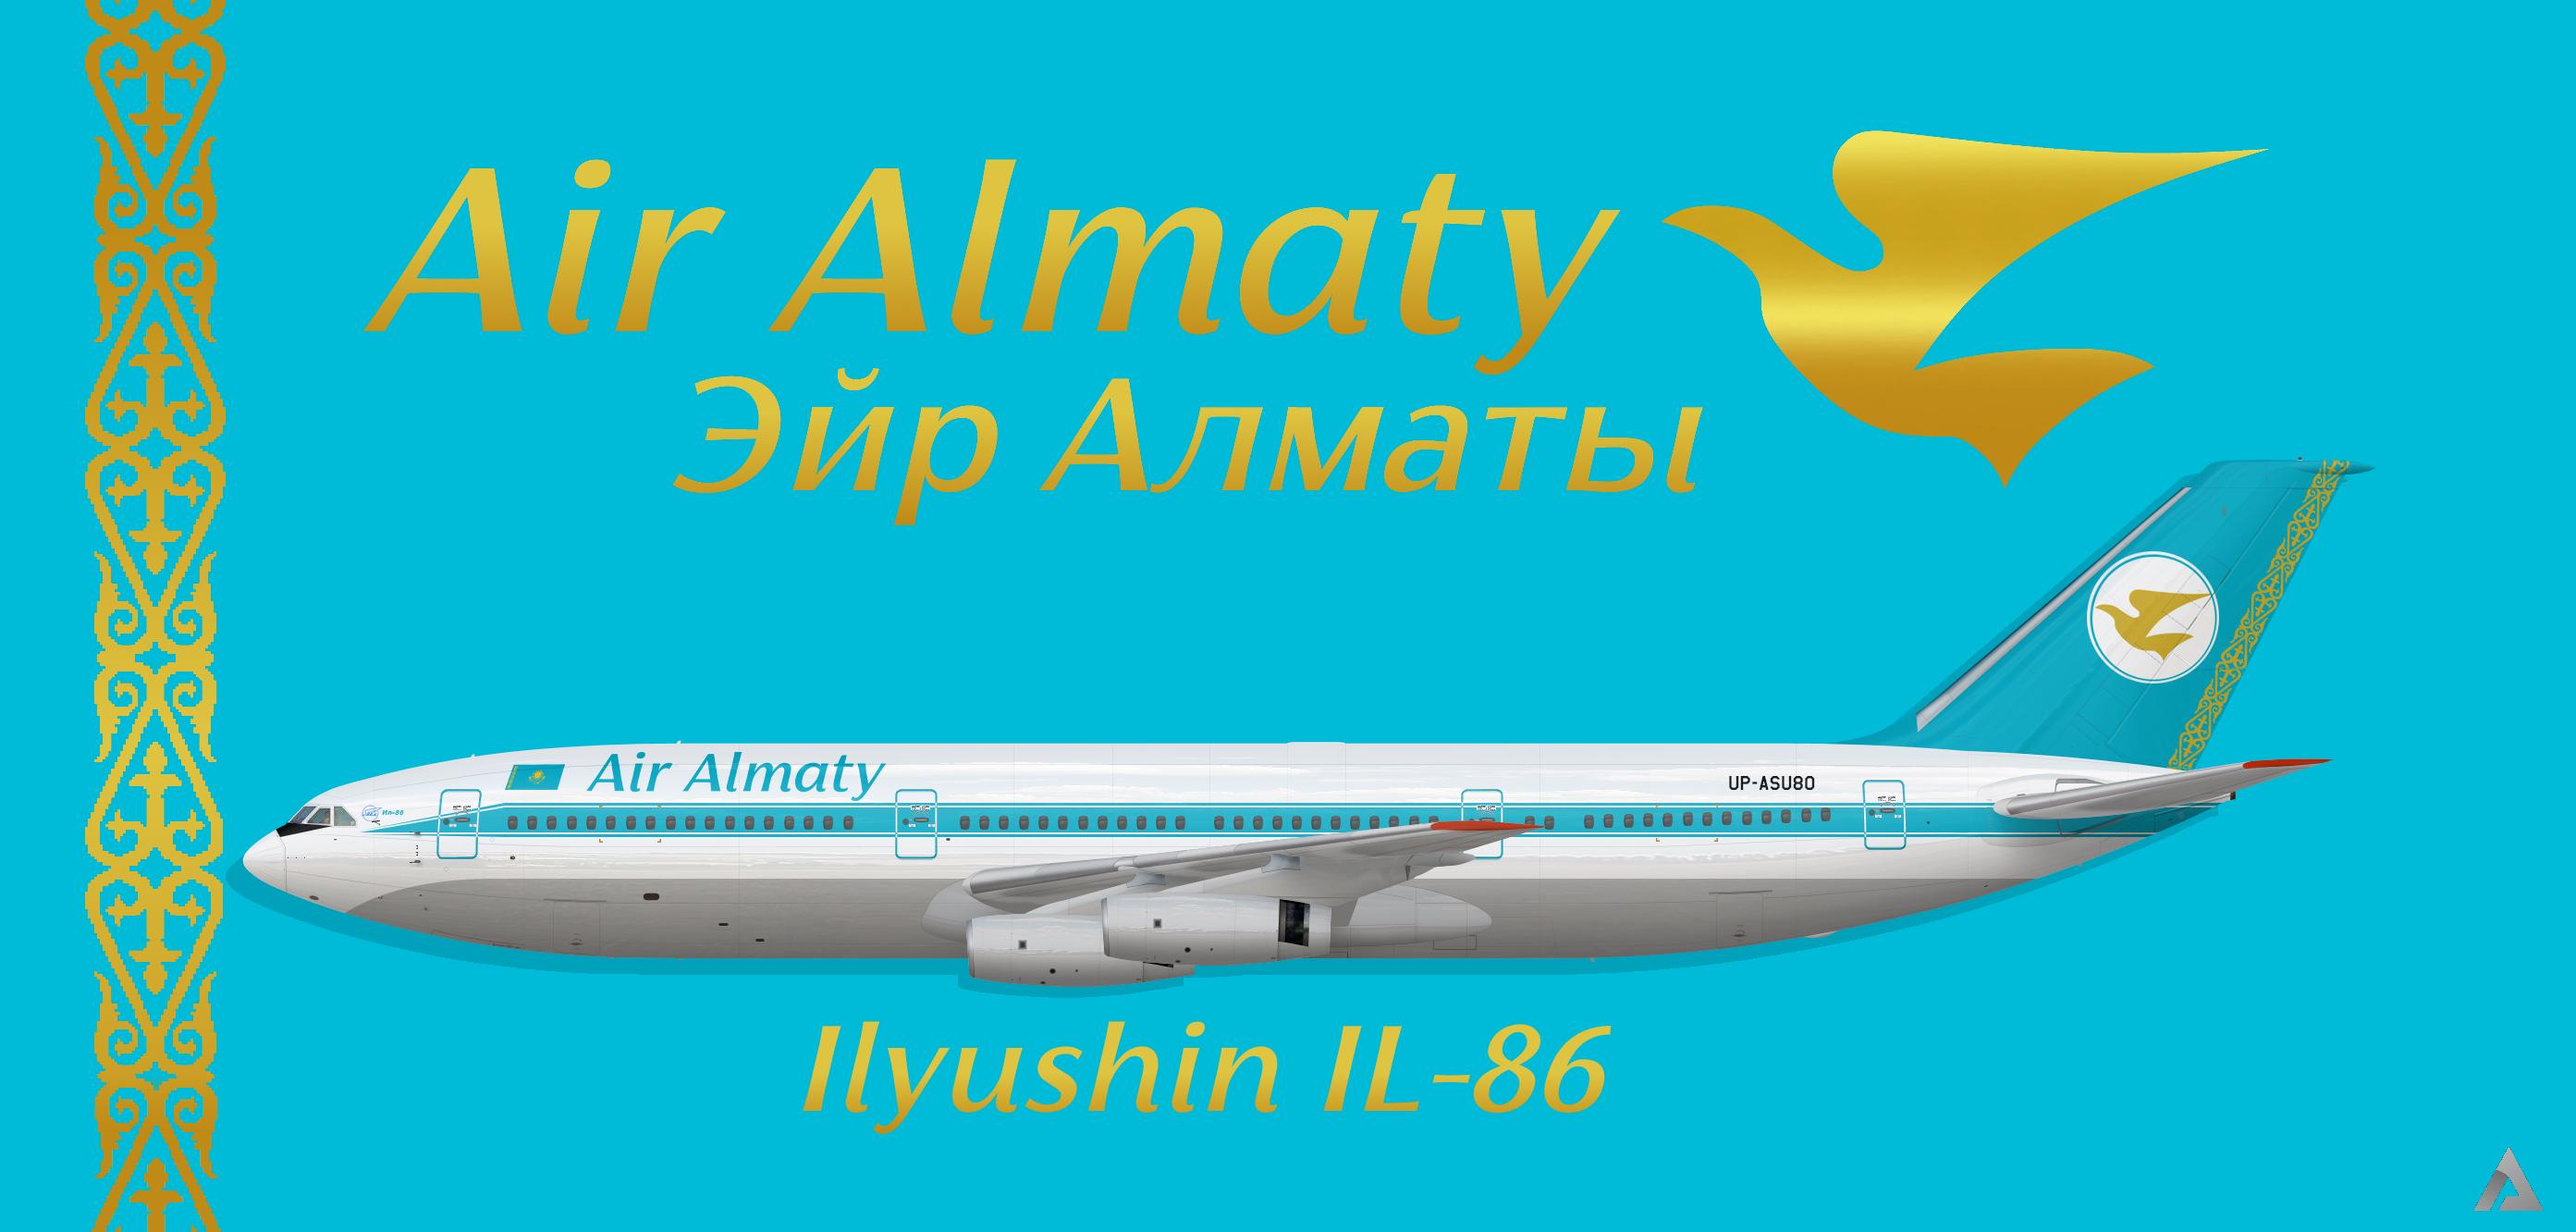 kazakhstan_babyflot_official.png